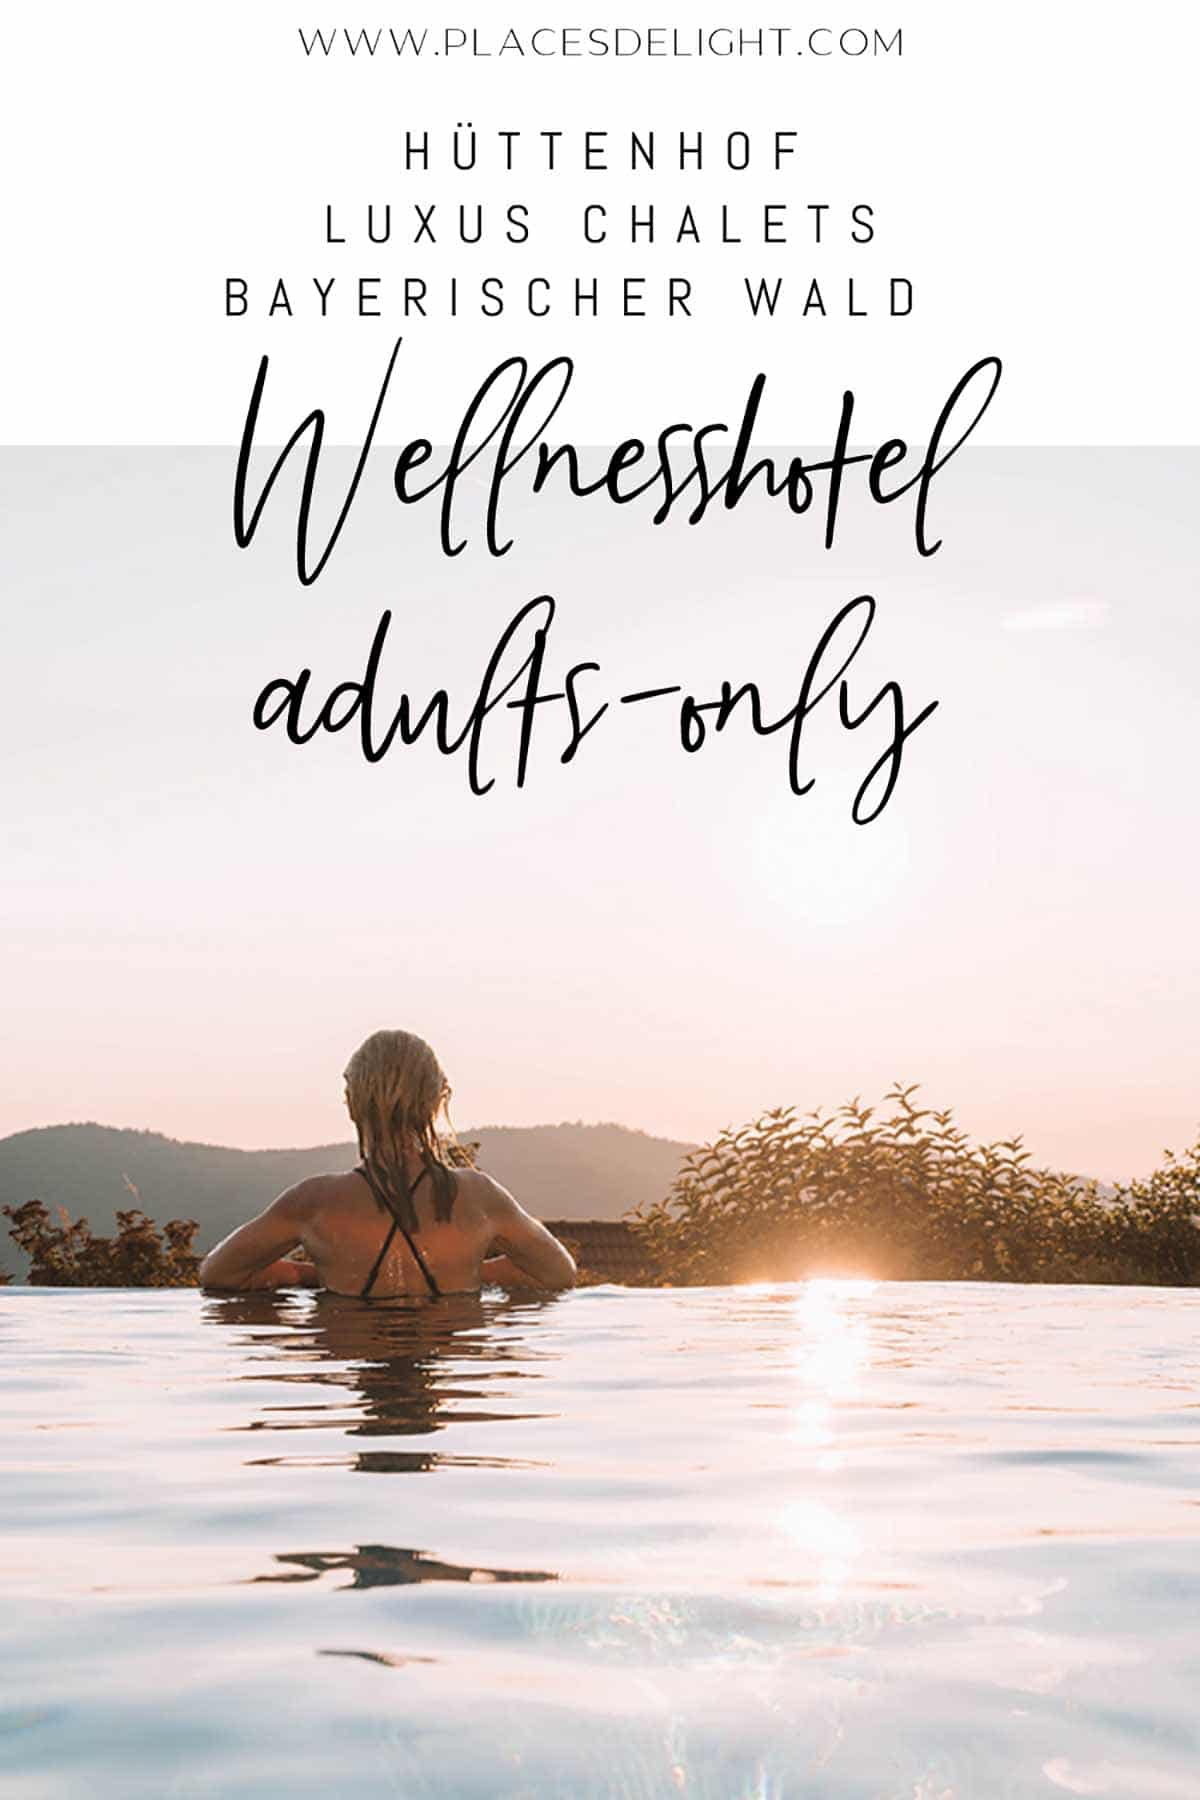 wellnesshotel-huettenhof-bayerischer-wald-placesdelight